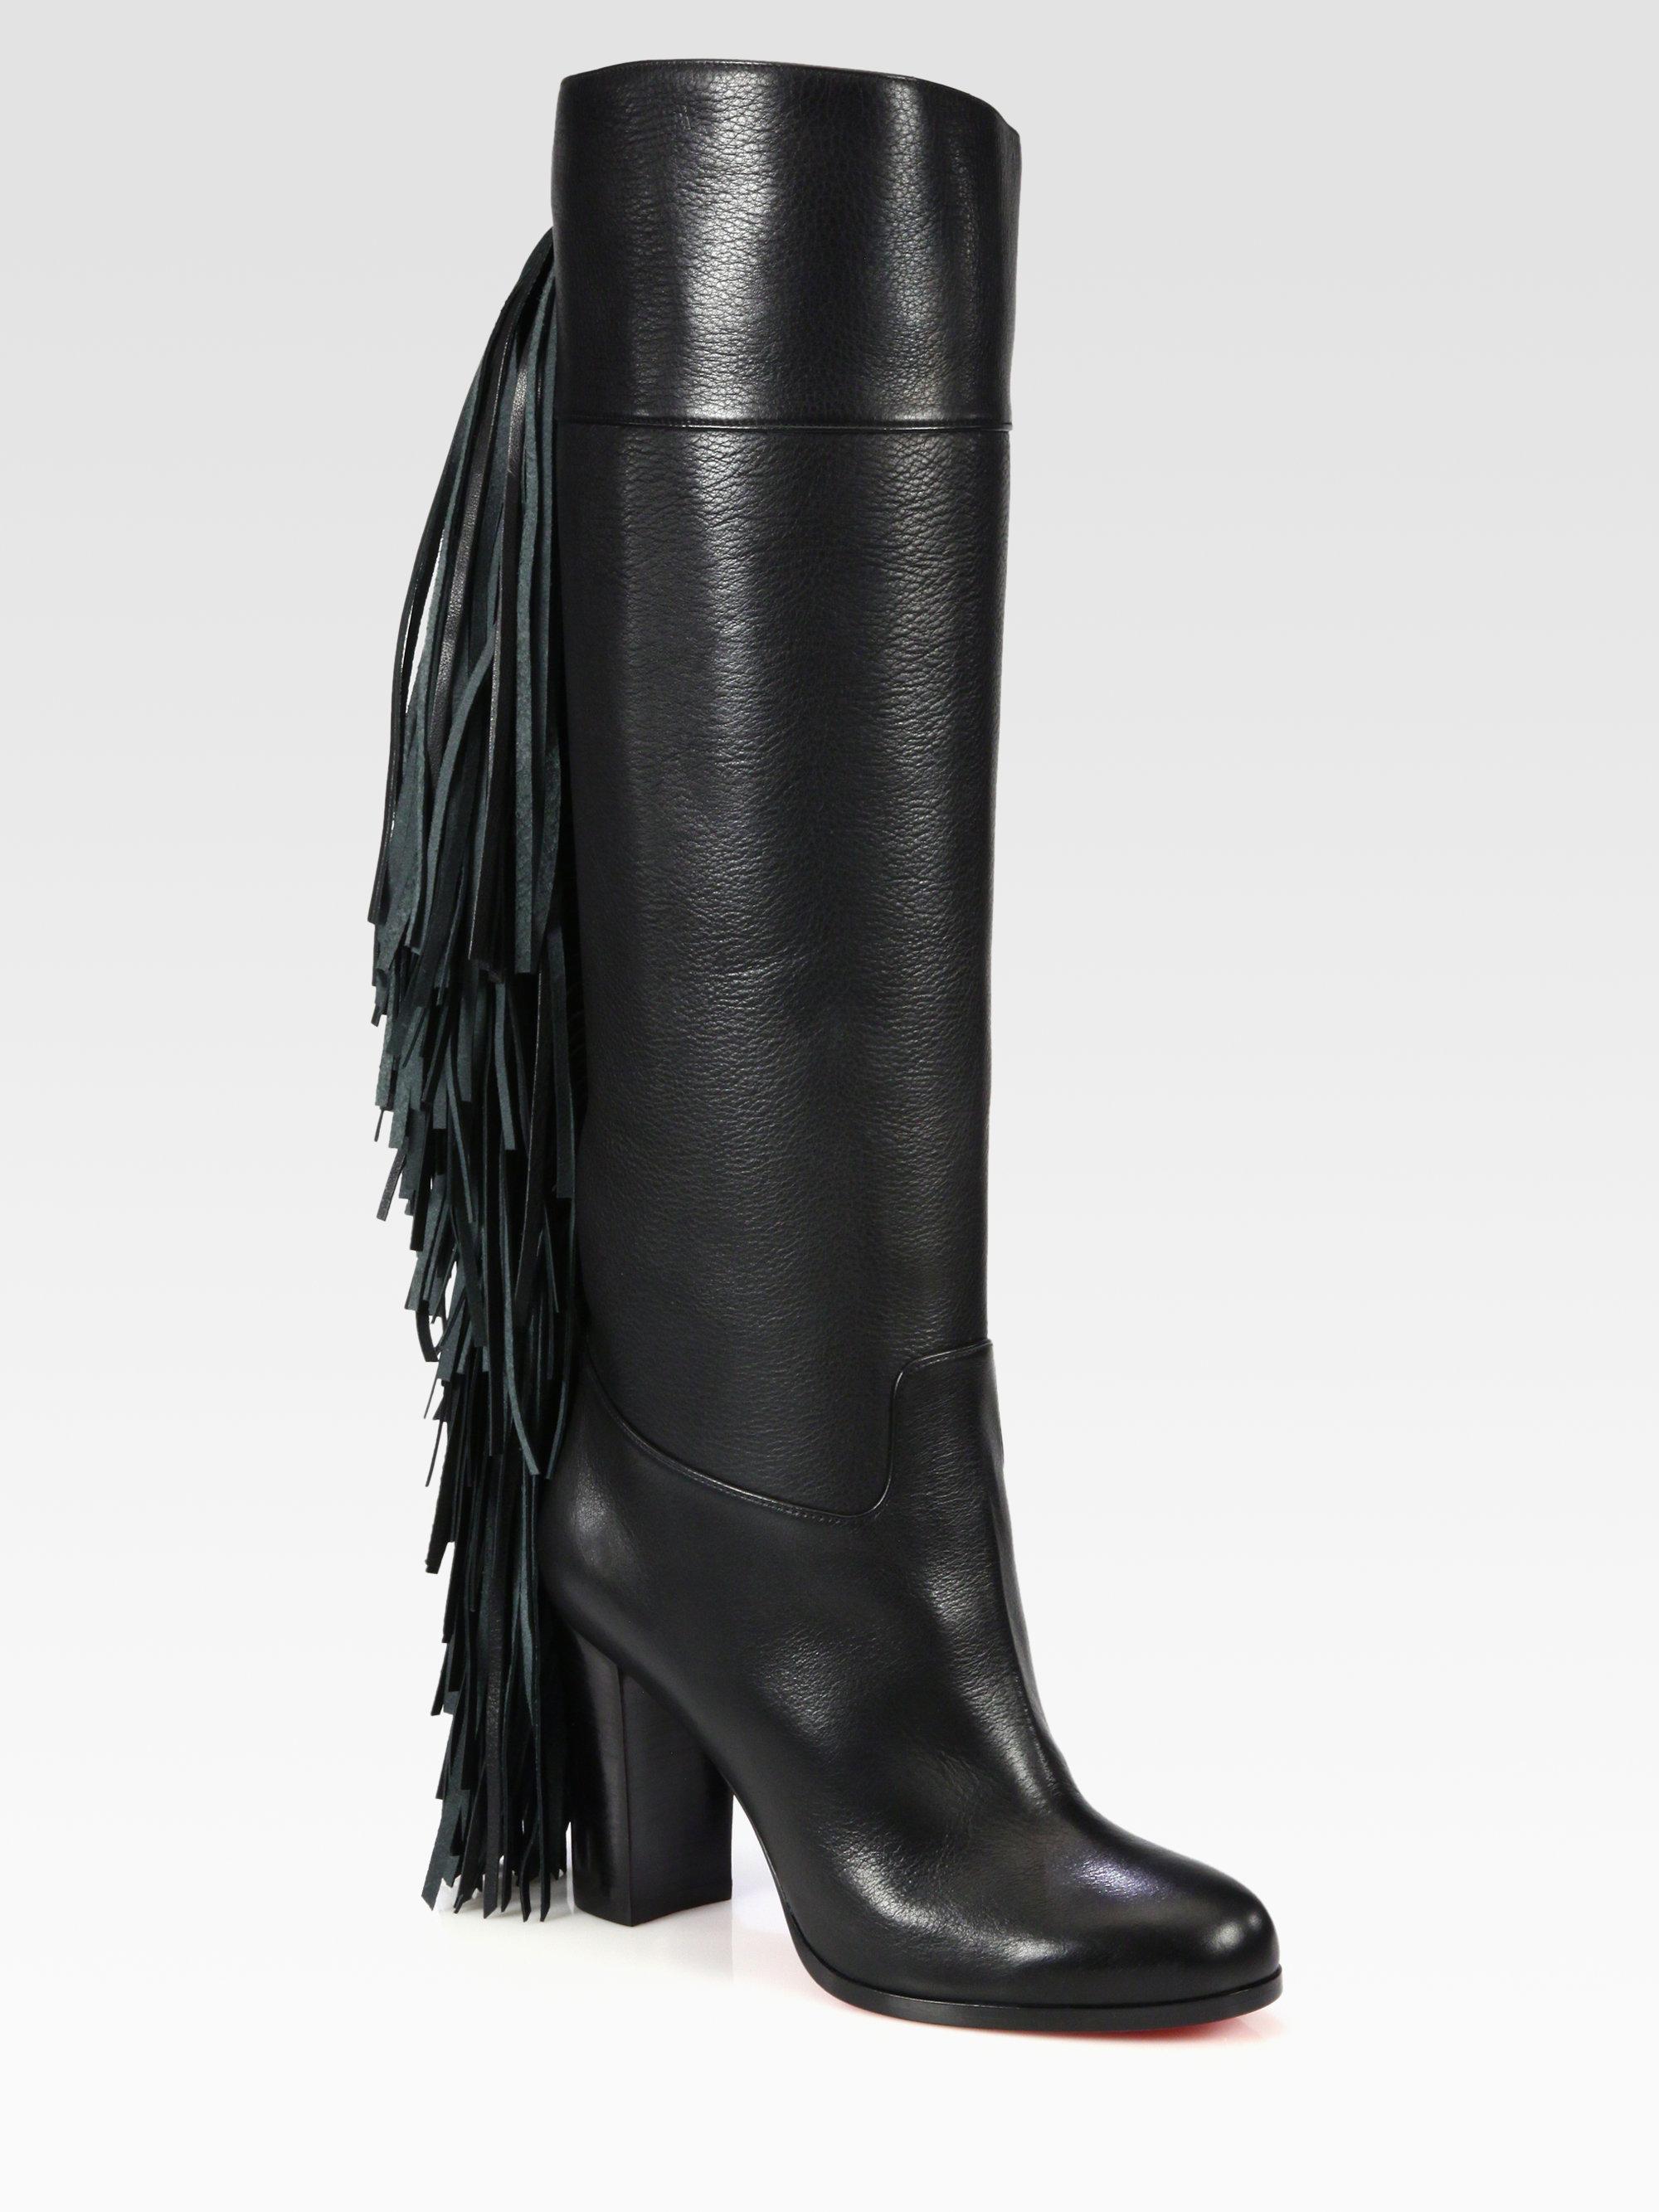 huge discount 5329f 90b60 Christian Louboutin Glamafrange Fringe Leather Boots in ...